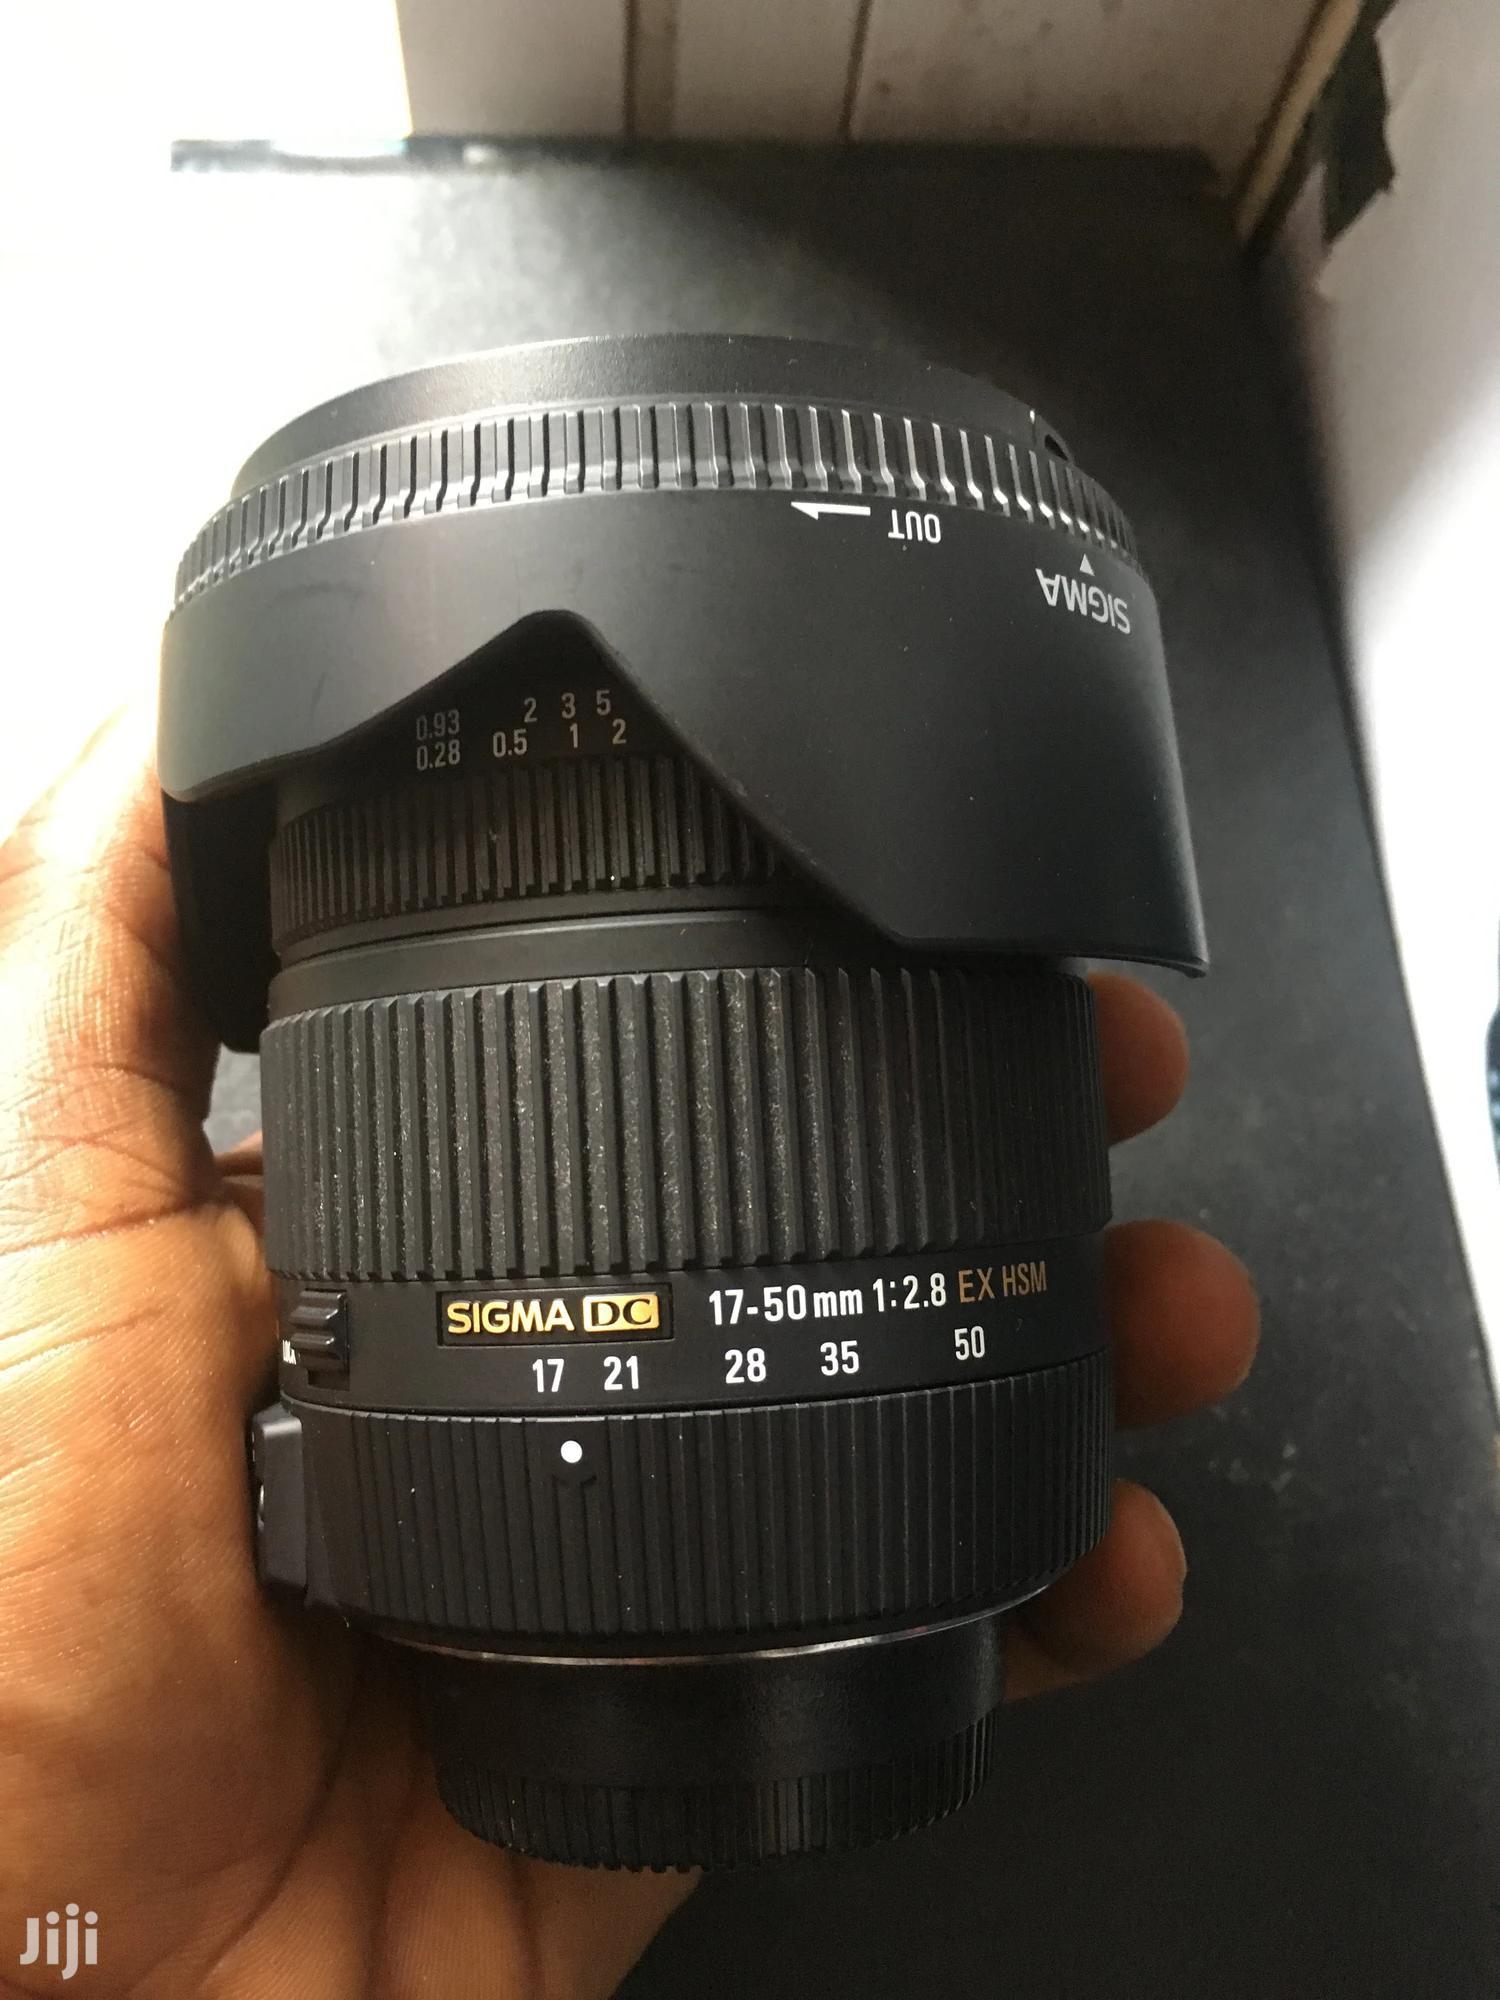 Archive: Nikon Lens 17-50mm Sigma F Top 1.8